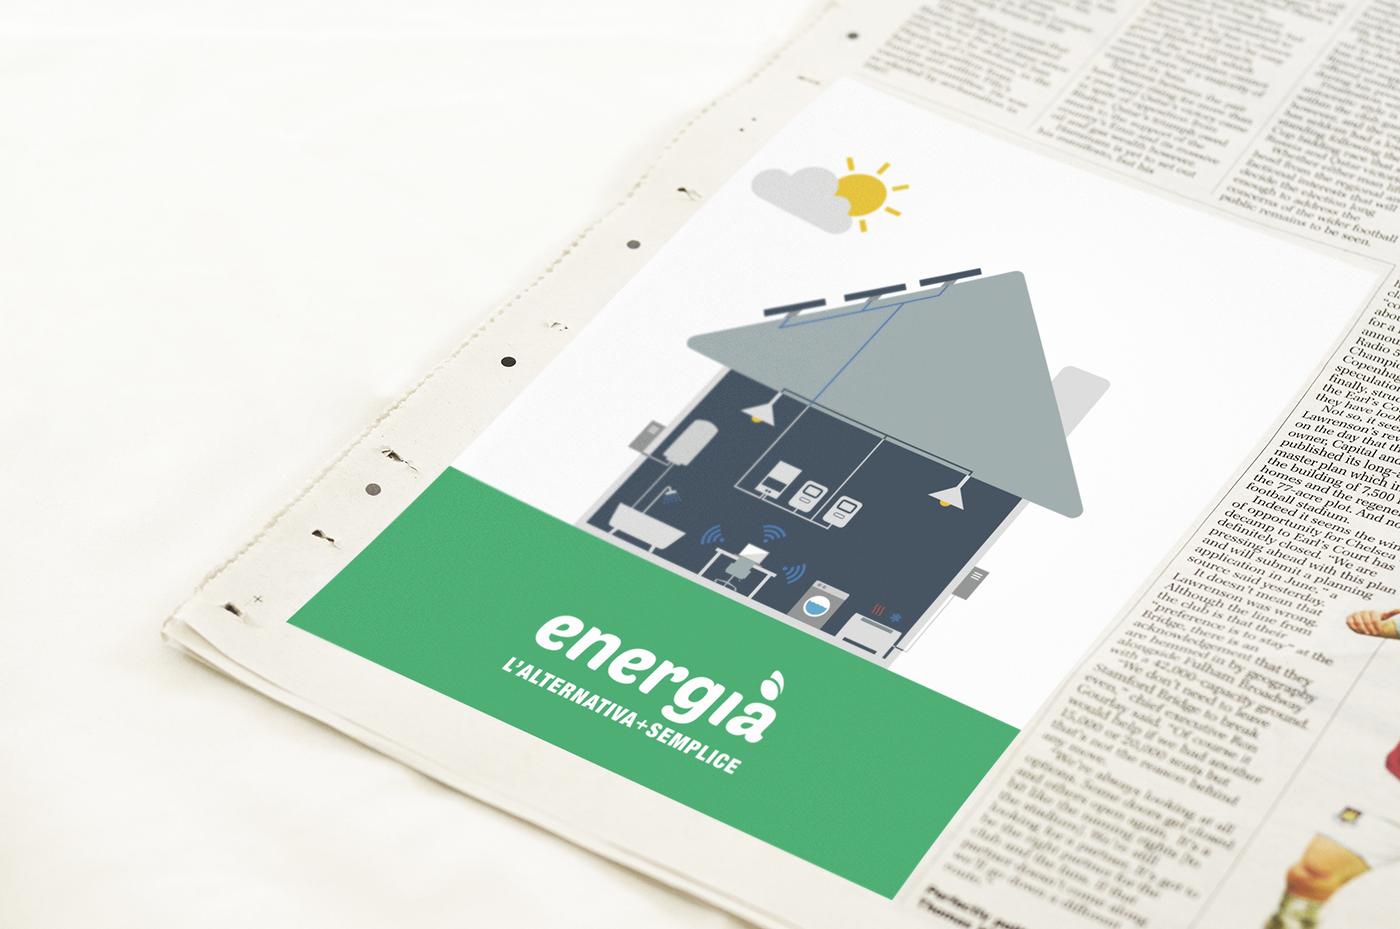 stationary corporate solar panel Sun energy saving Gas electric energy thermohydraulic light company